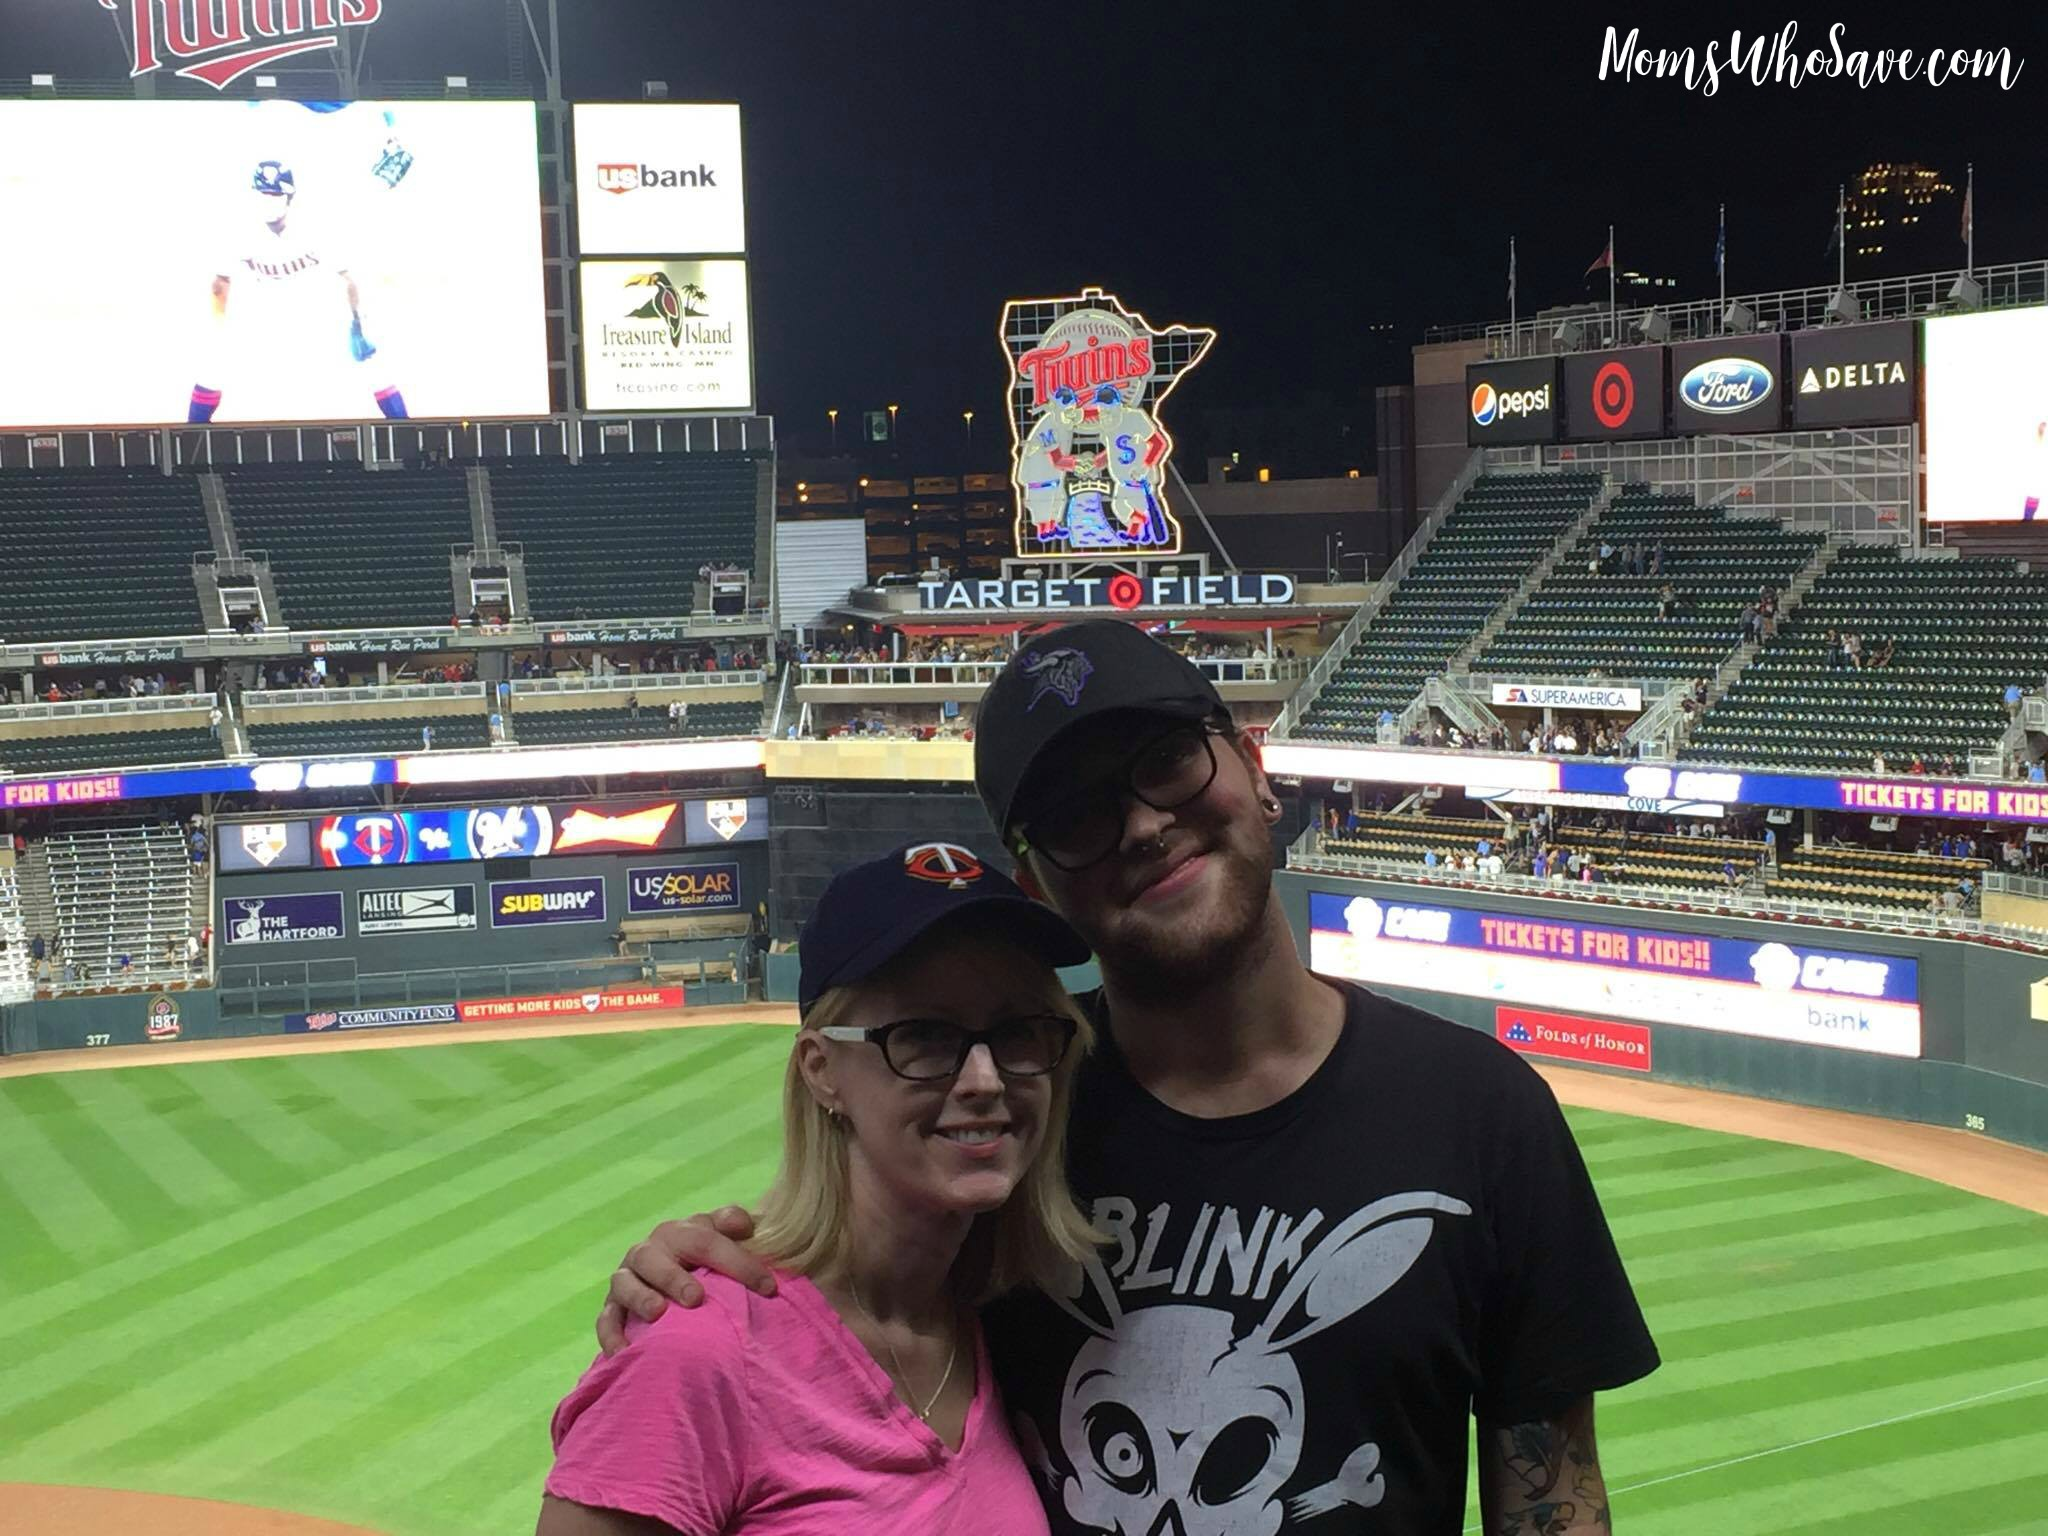 twins stadium - target field